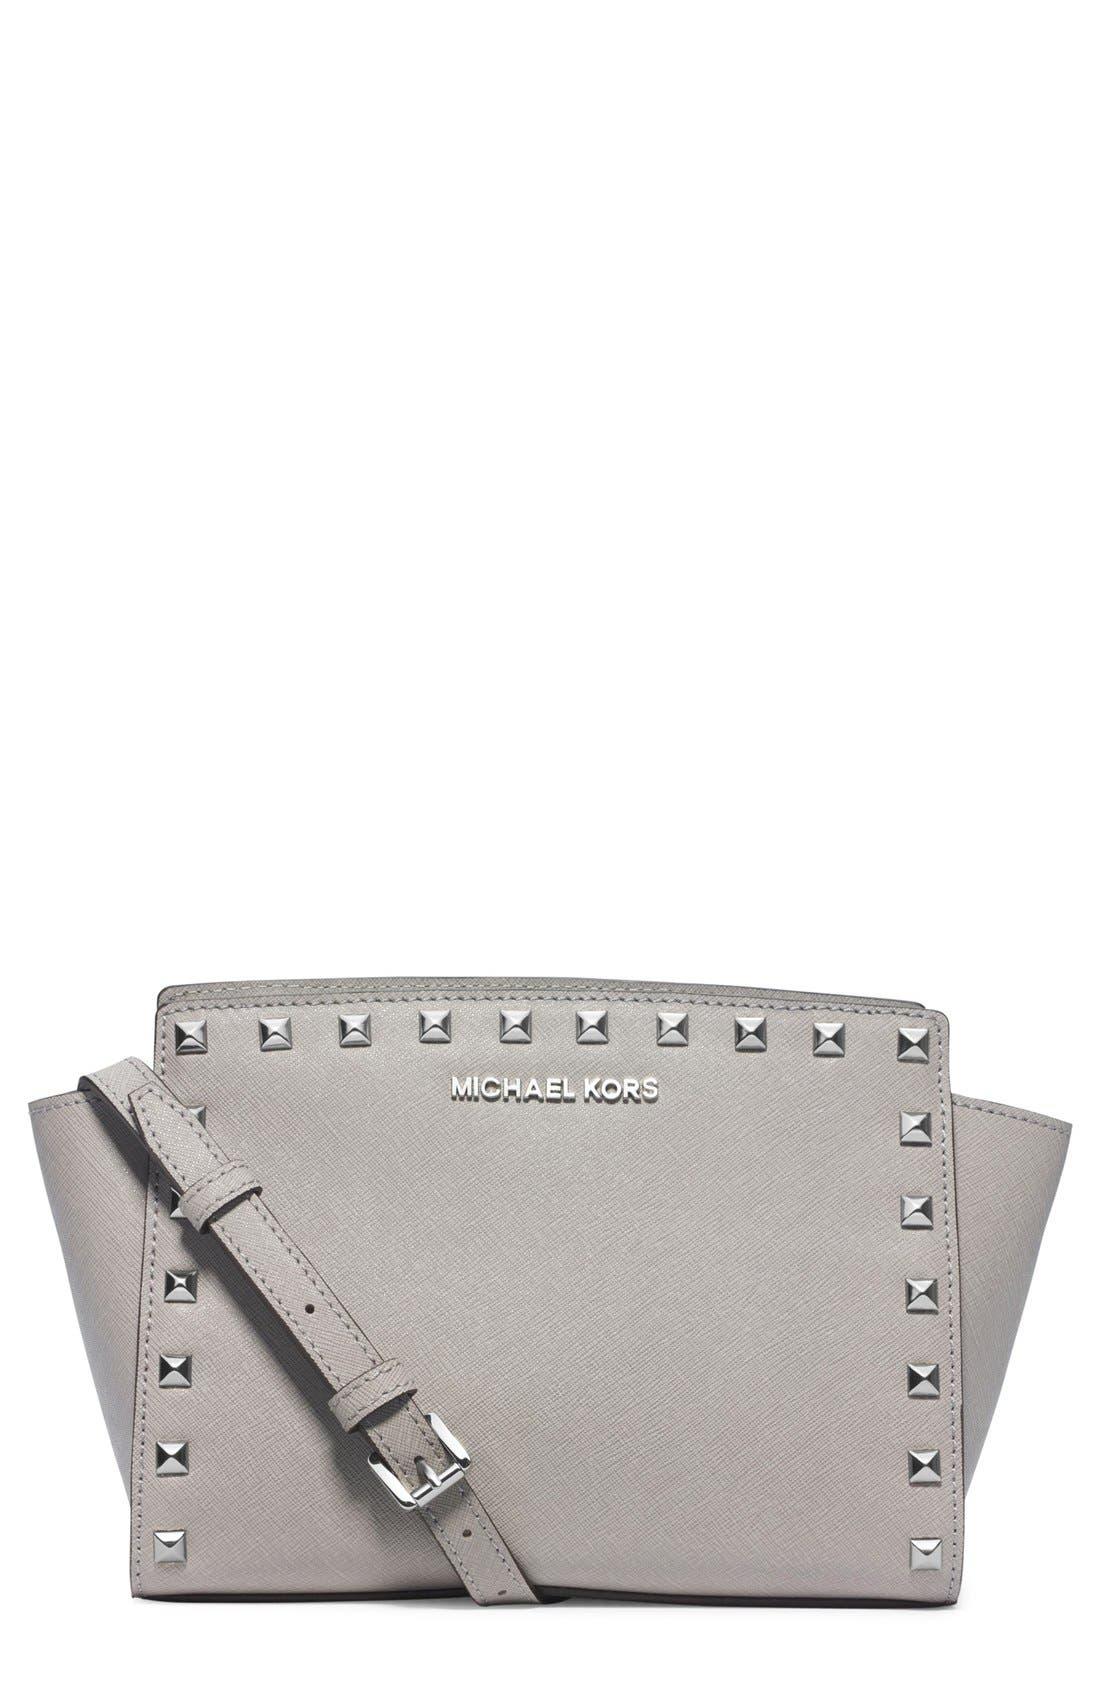 Alternate Image 1 Selected - MICHAEL Michael Kors 'Medium Selma' Studded Saffiano Leather Crossbody Bag